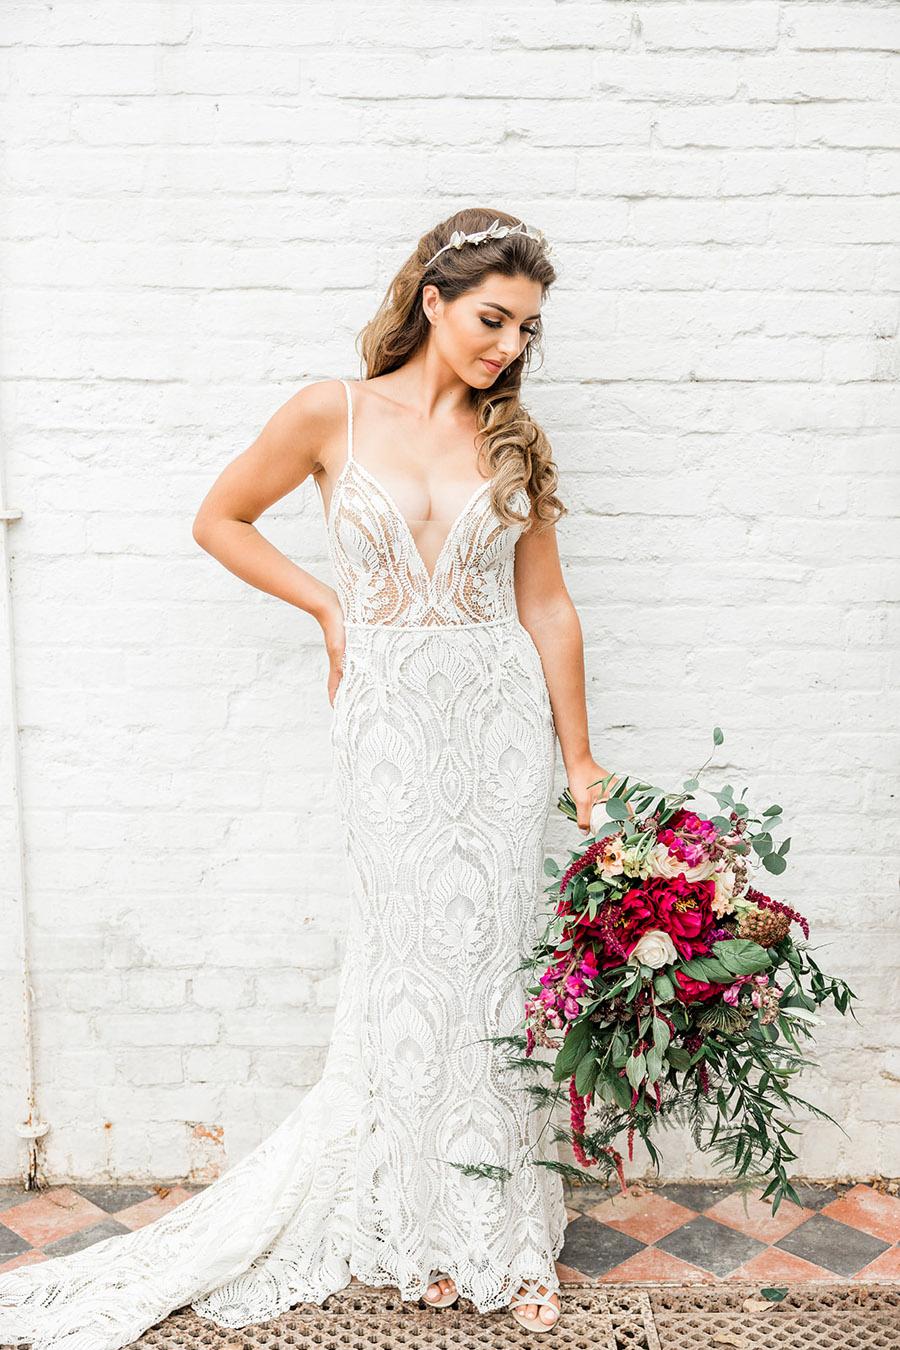 Modern Boho wedding style inspiration from Slindon House, photographer credit Kelsie Scully Photography (29)